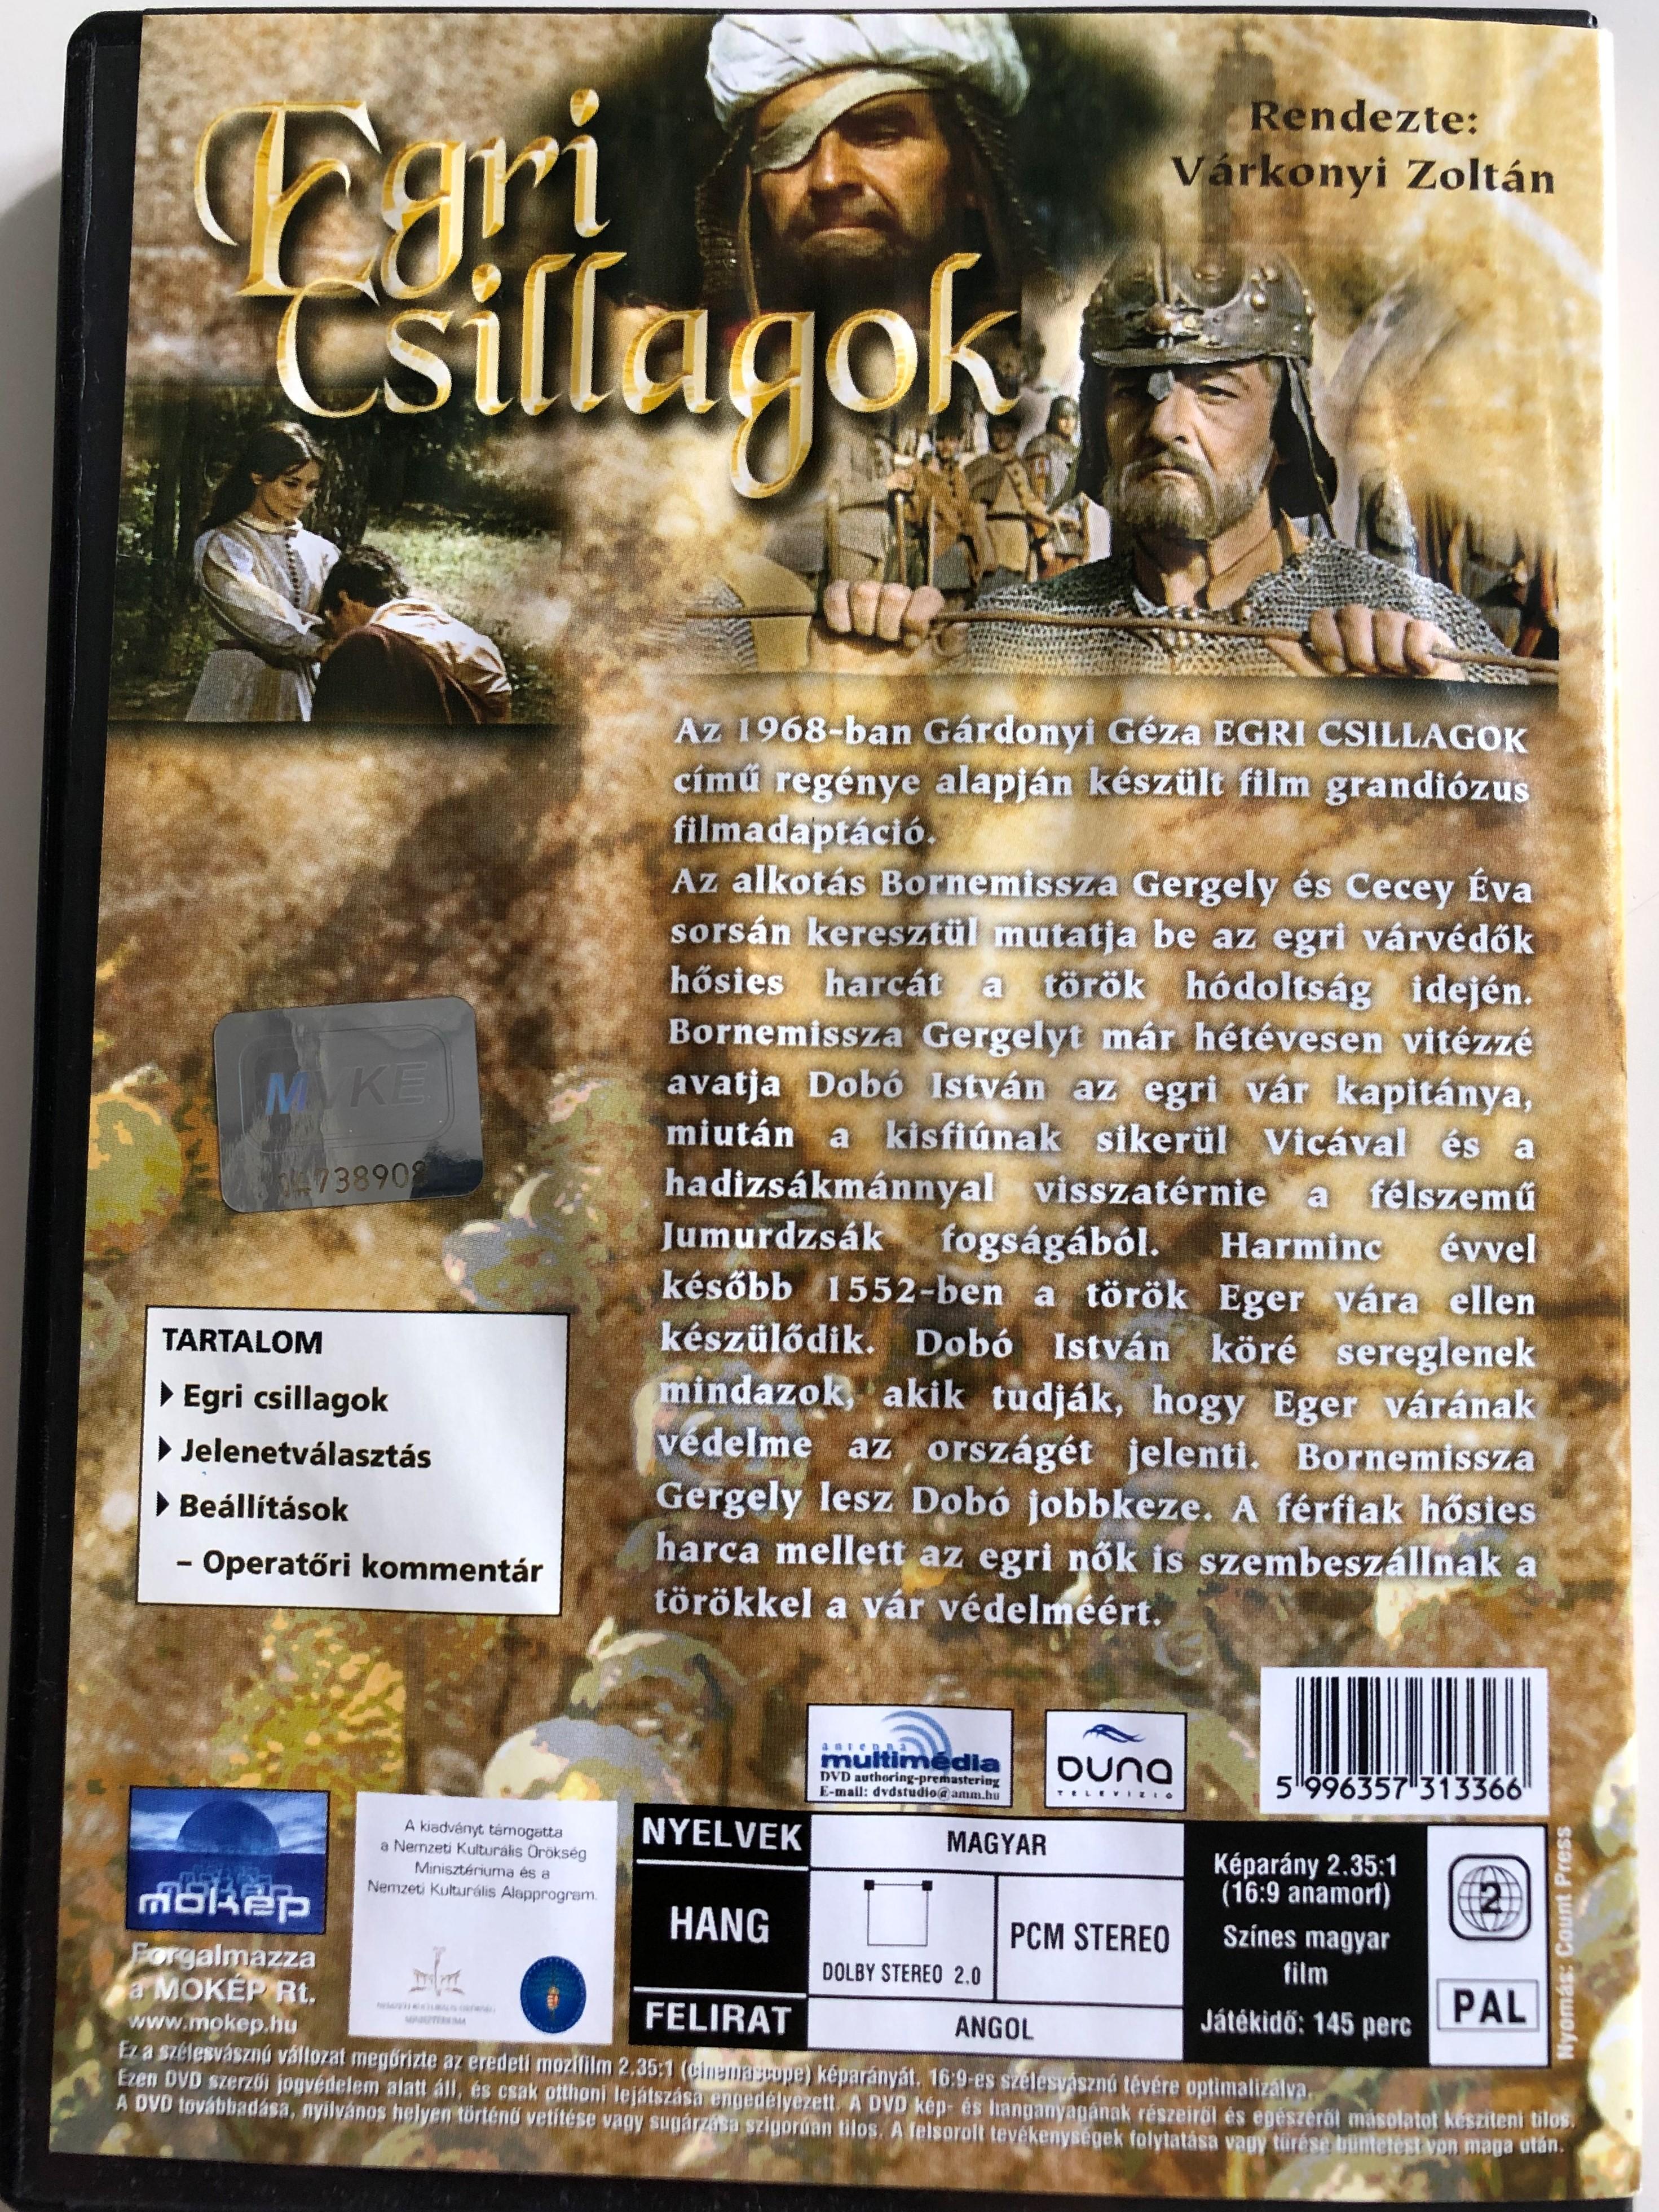 egri-csillagok-dvd-1968-eclipse-of-the-crescent-moon-directed-by-v-rkonyi-zolt-n-starring-sinkovits-imre-kov-cs-istv-n-venczel-vera-hungarian-classic-film-based-on-popular-literary-work-2-.jpg